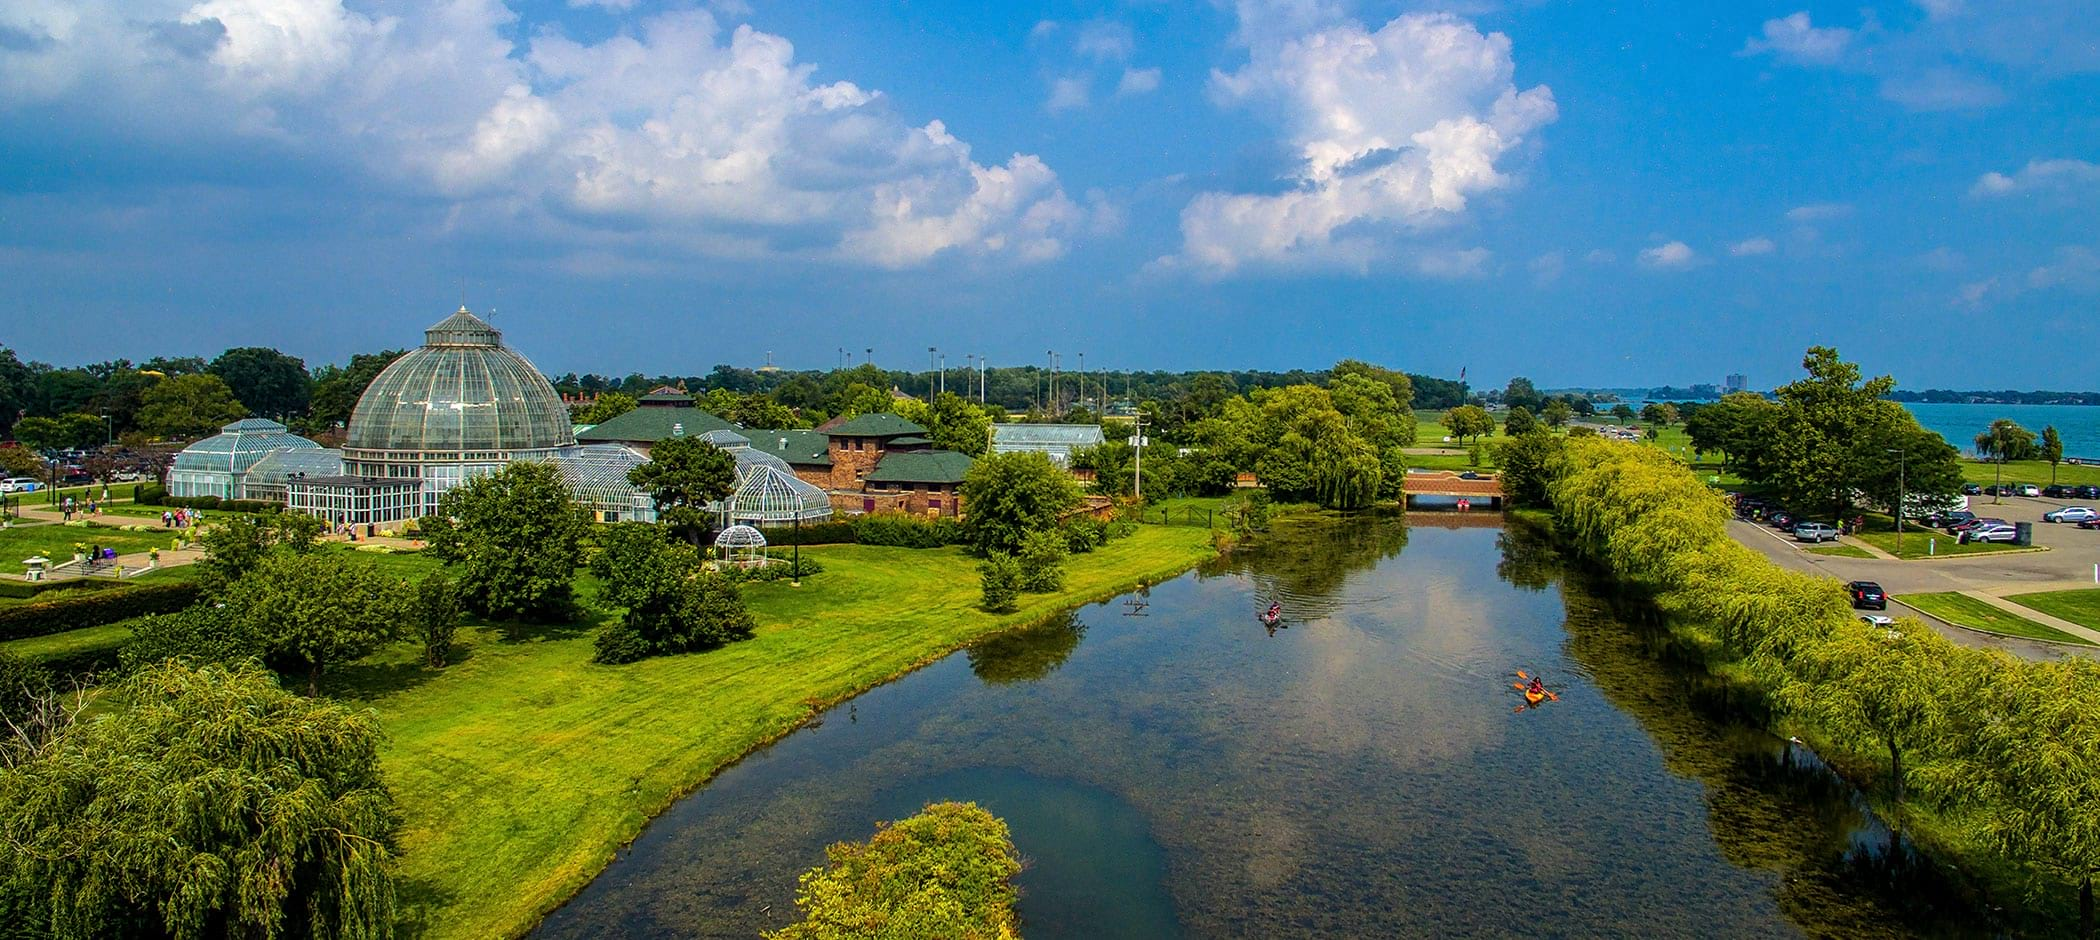 Belle Isle park Aerial view